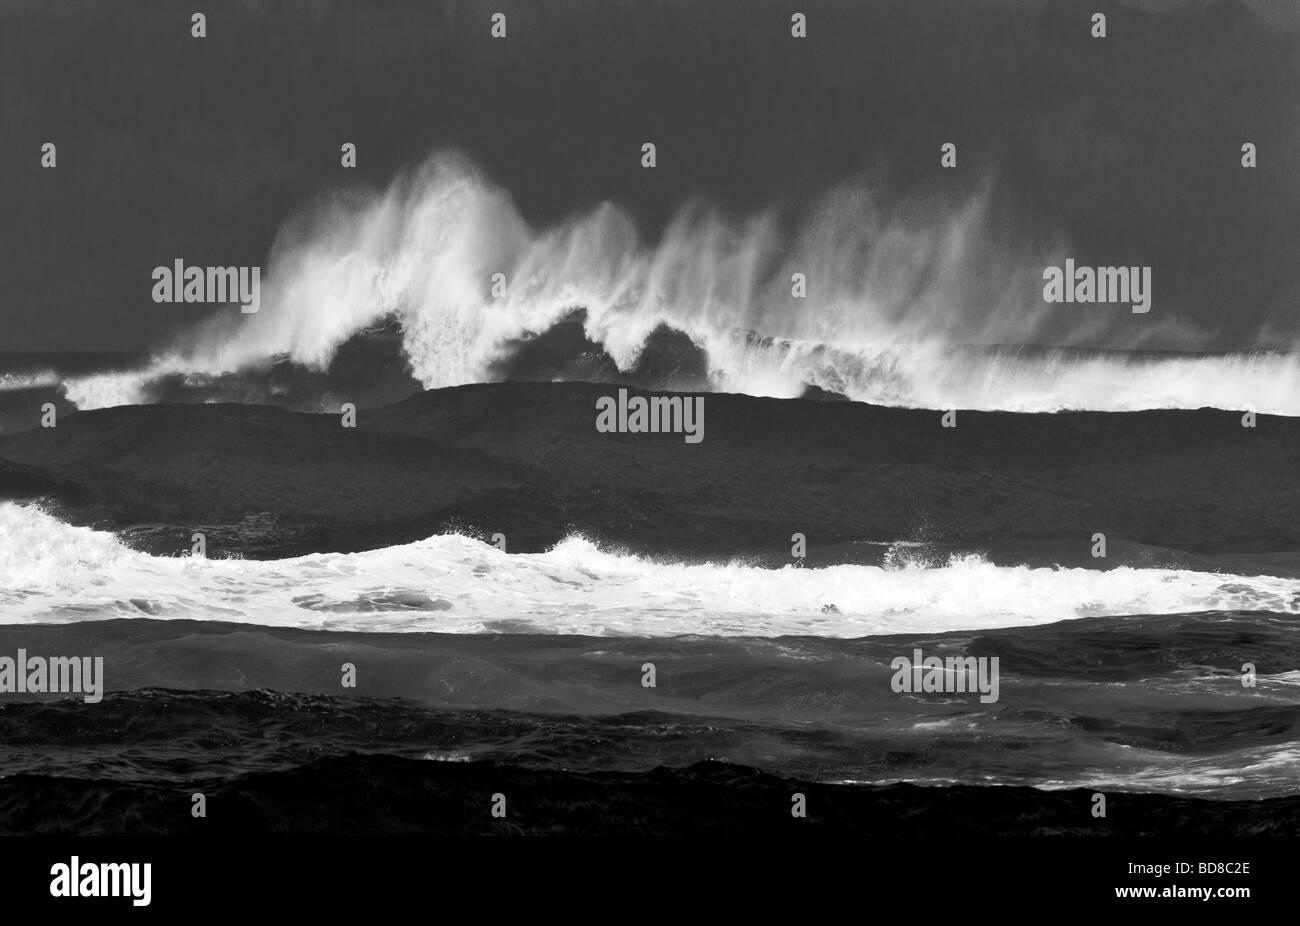 Large storm waves off Kauai coast Hawaii - Stock Image